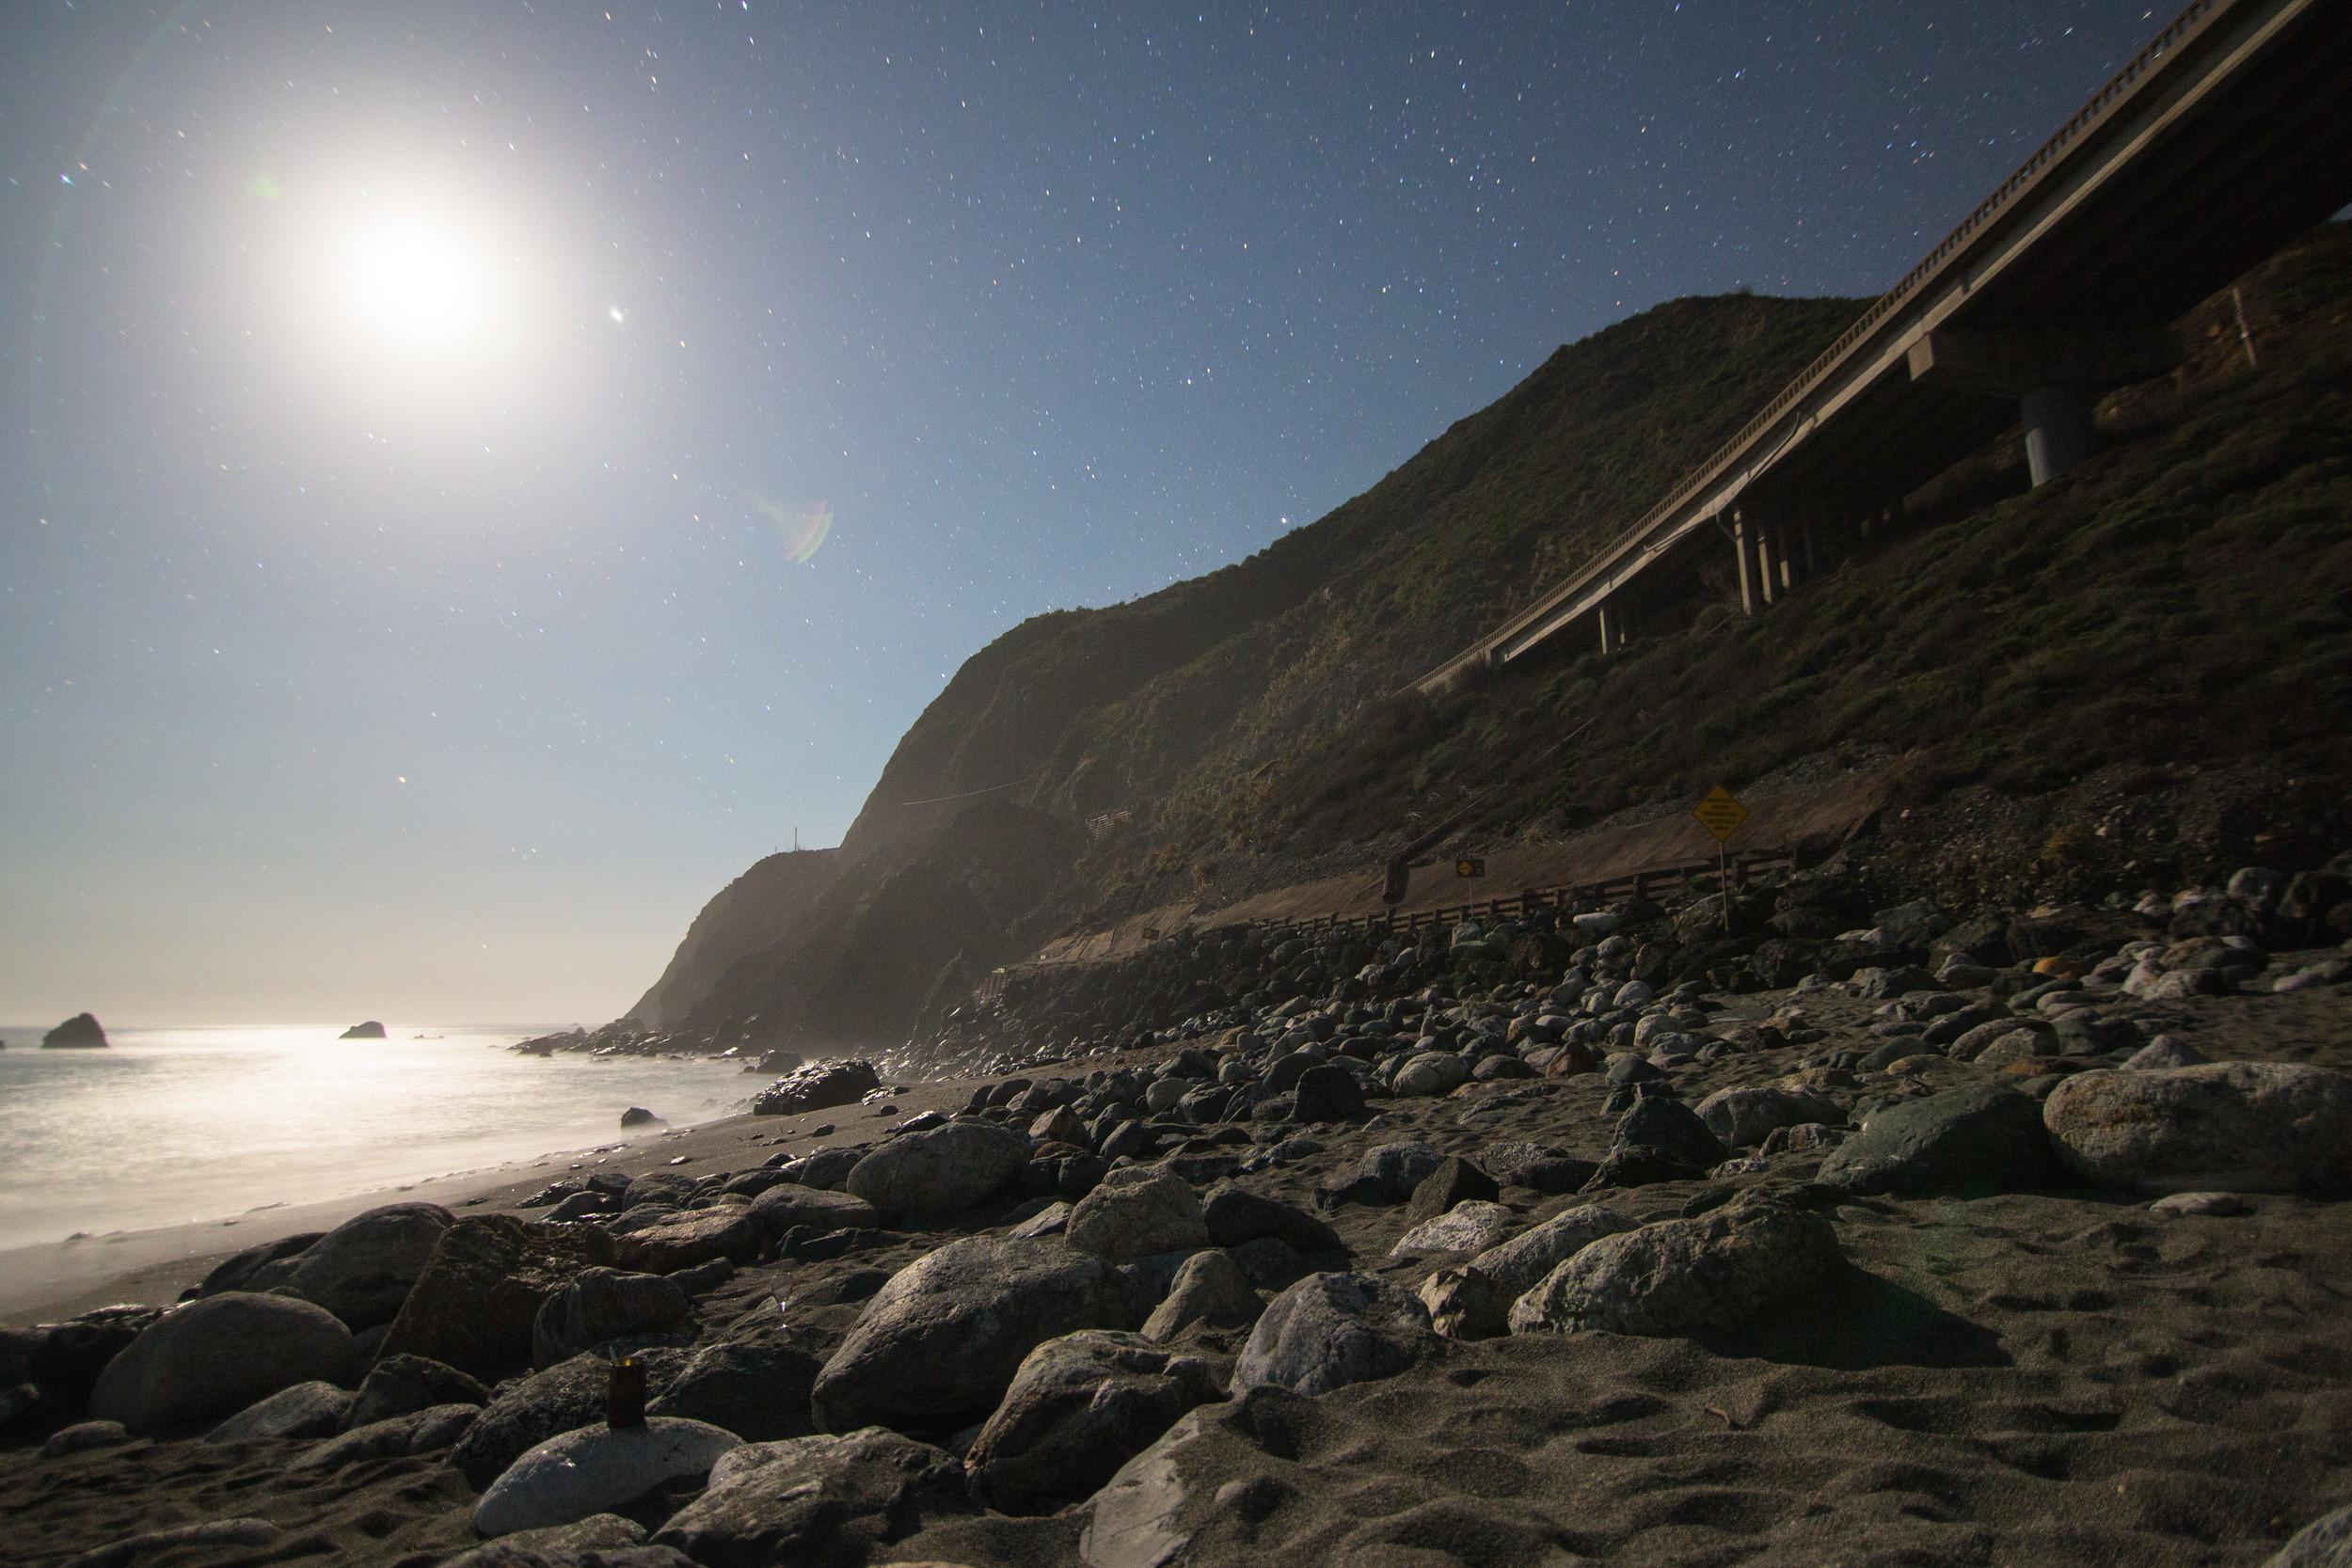 Cali trip - beach at night-7934.jpg